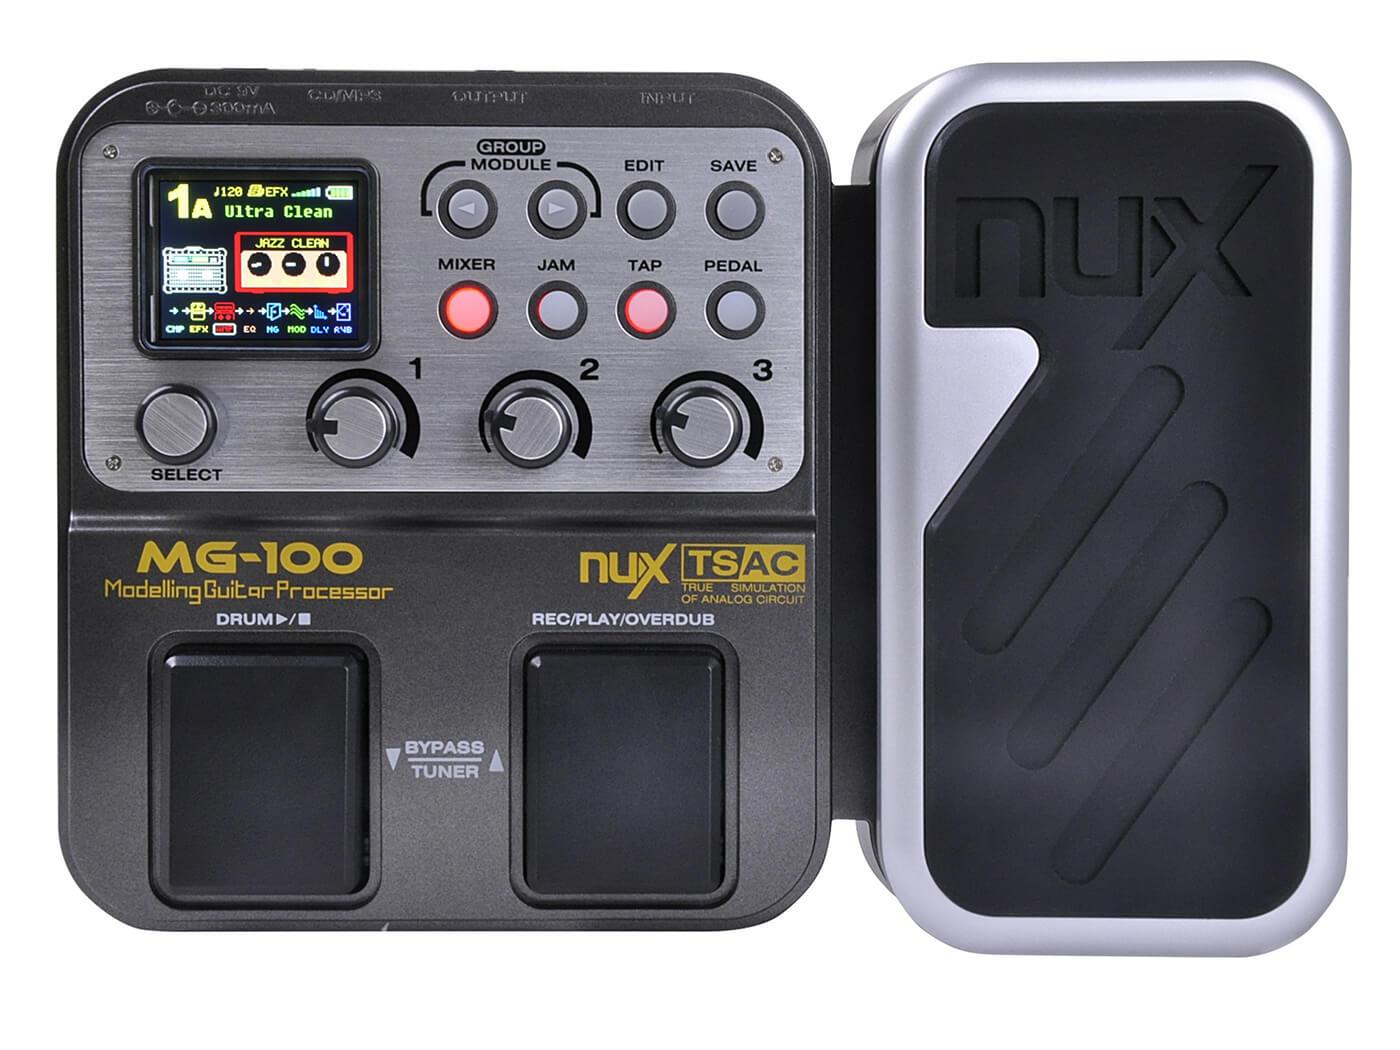 nux mg-100